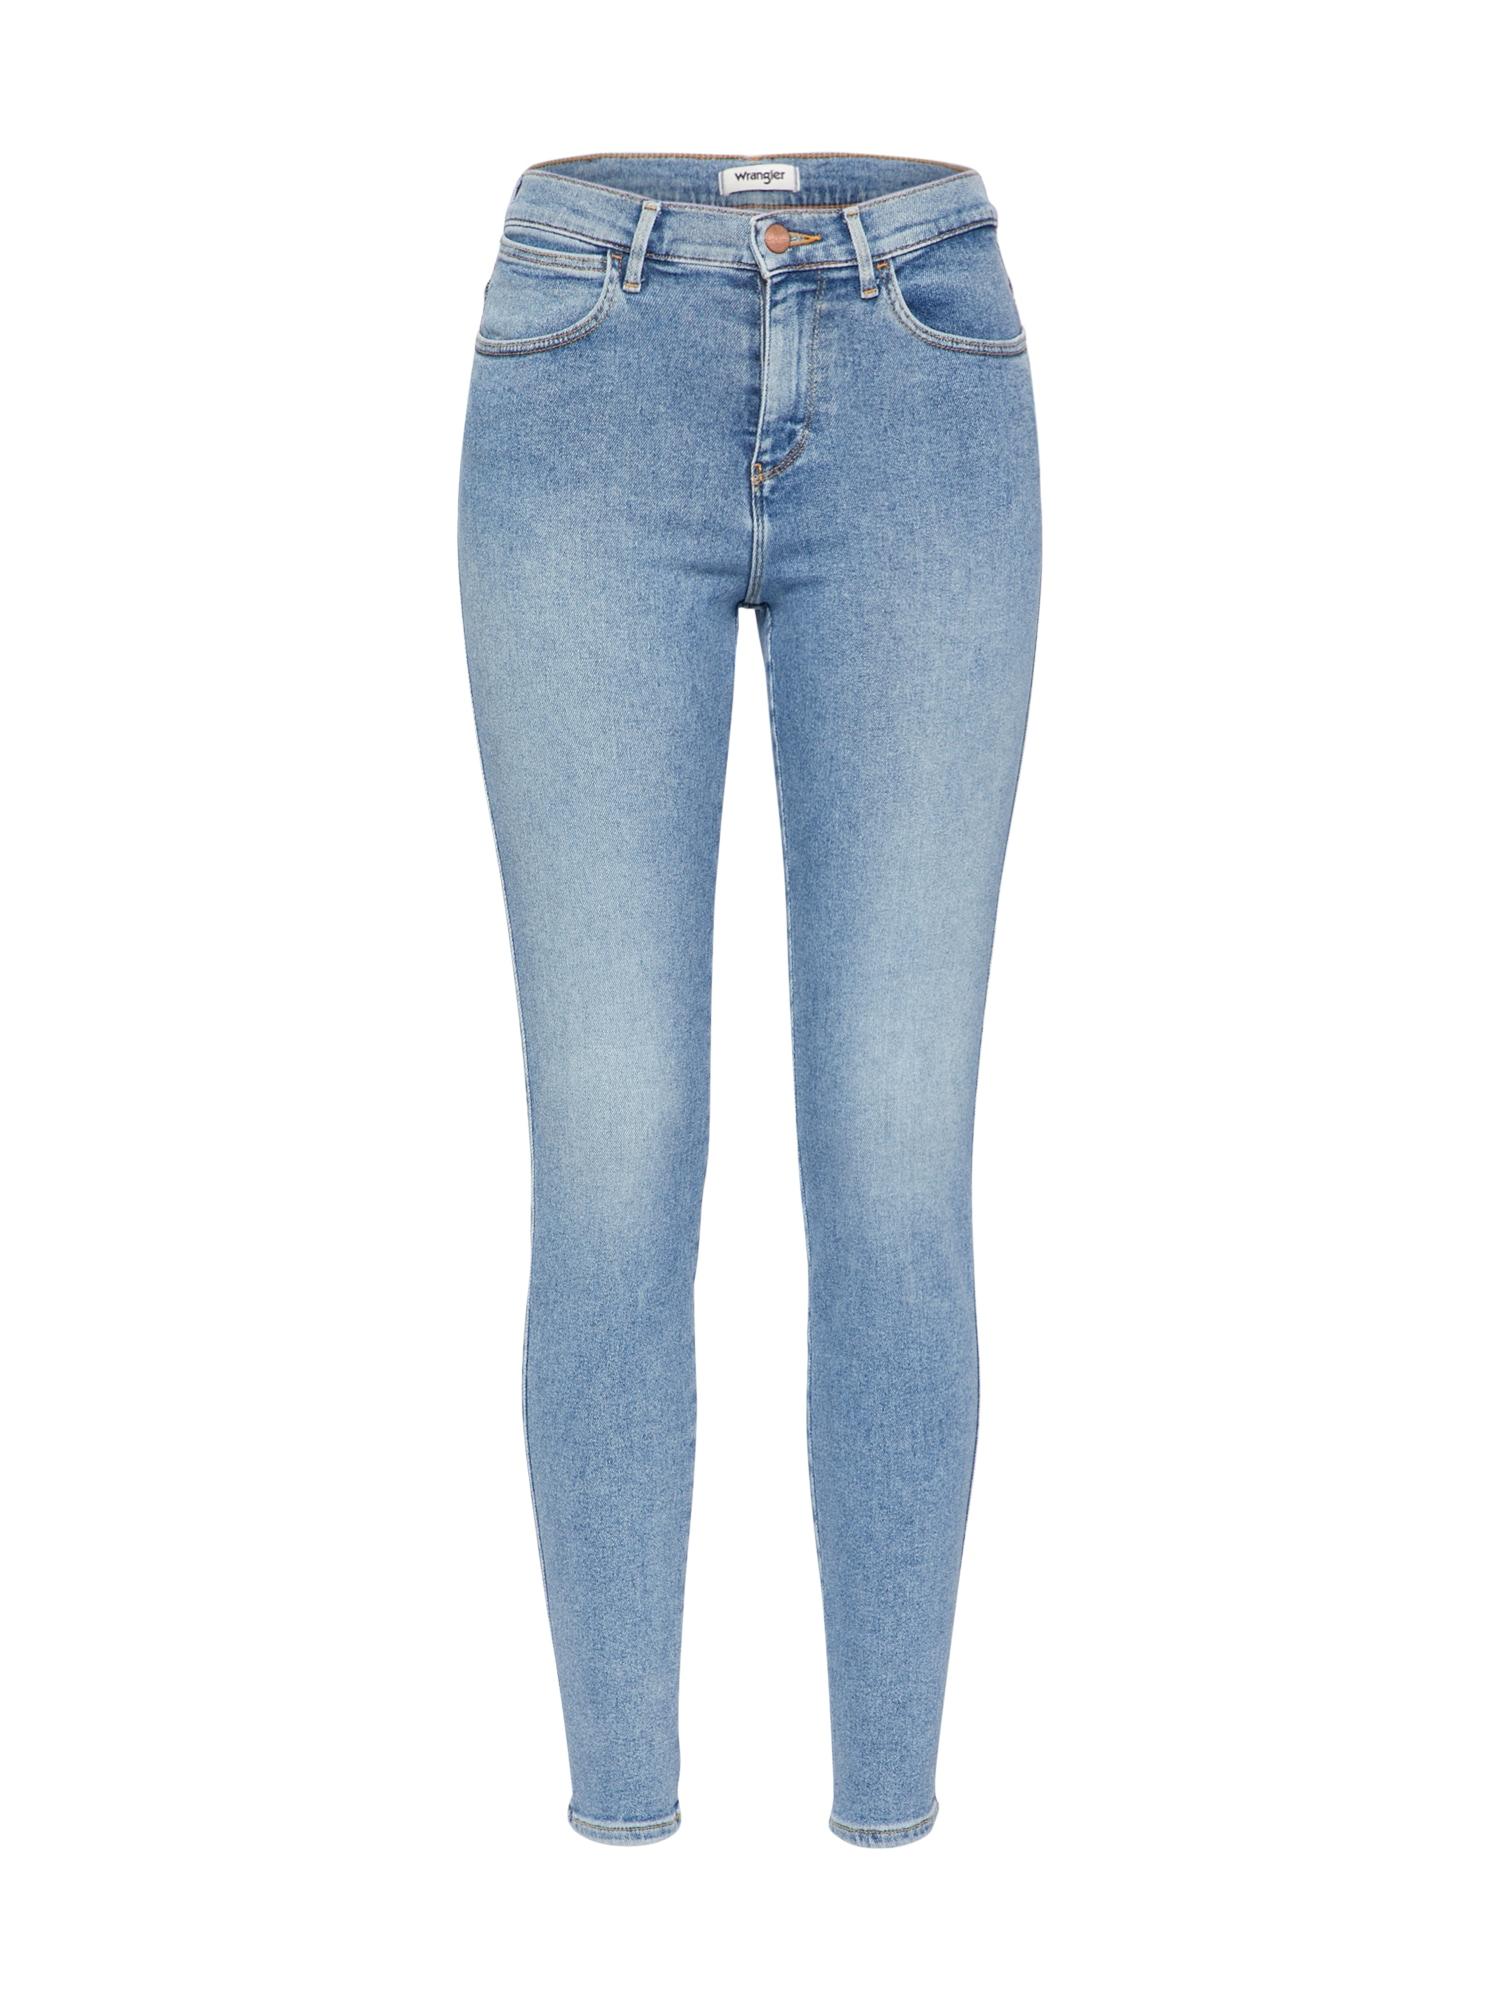 WRANGLER Dames Jeans lichtblauw